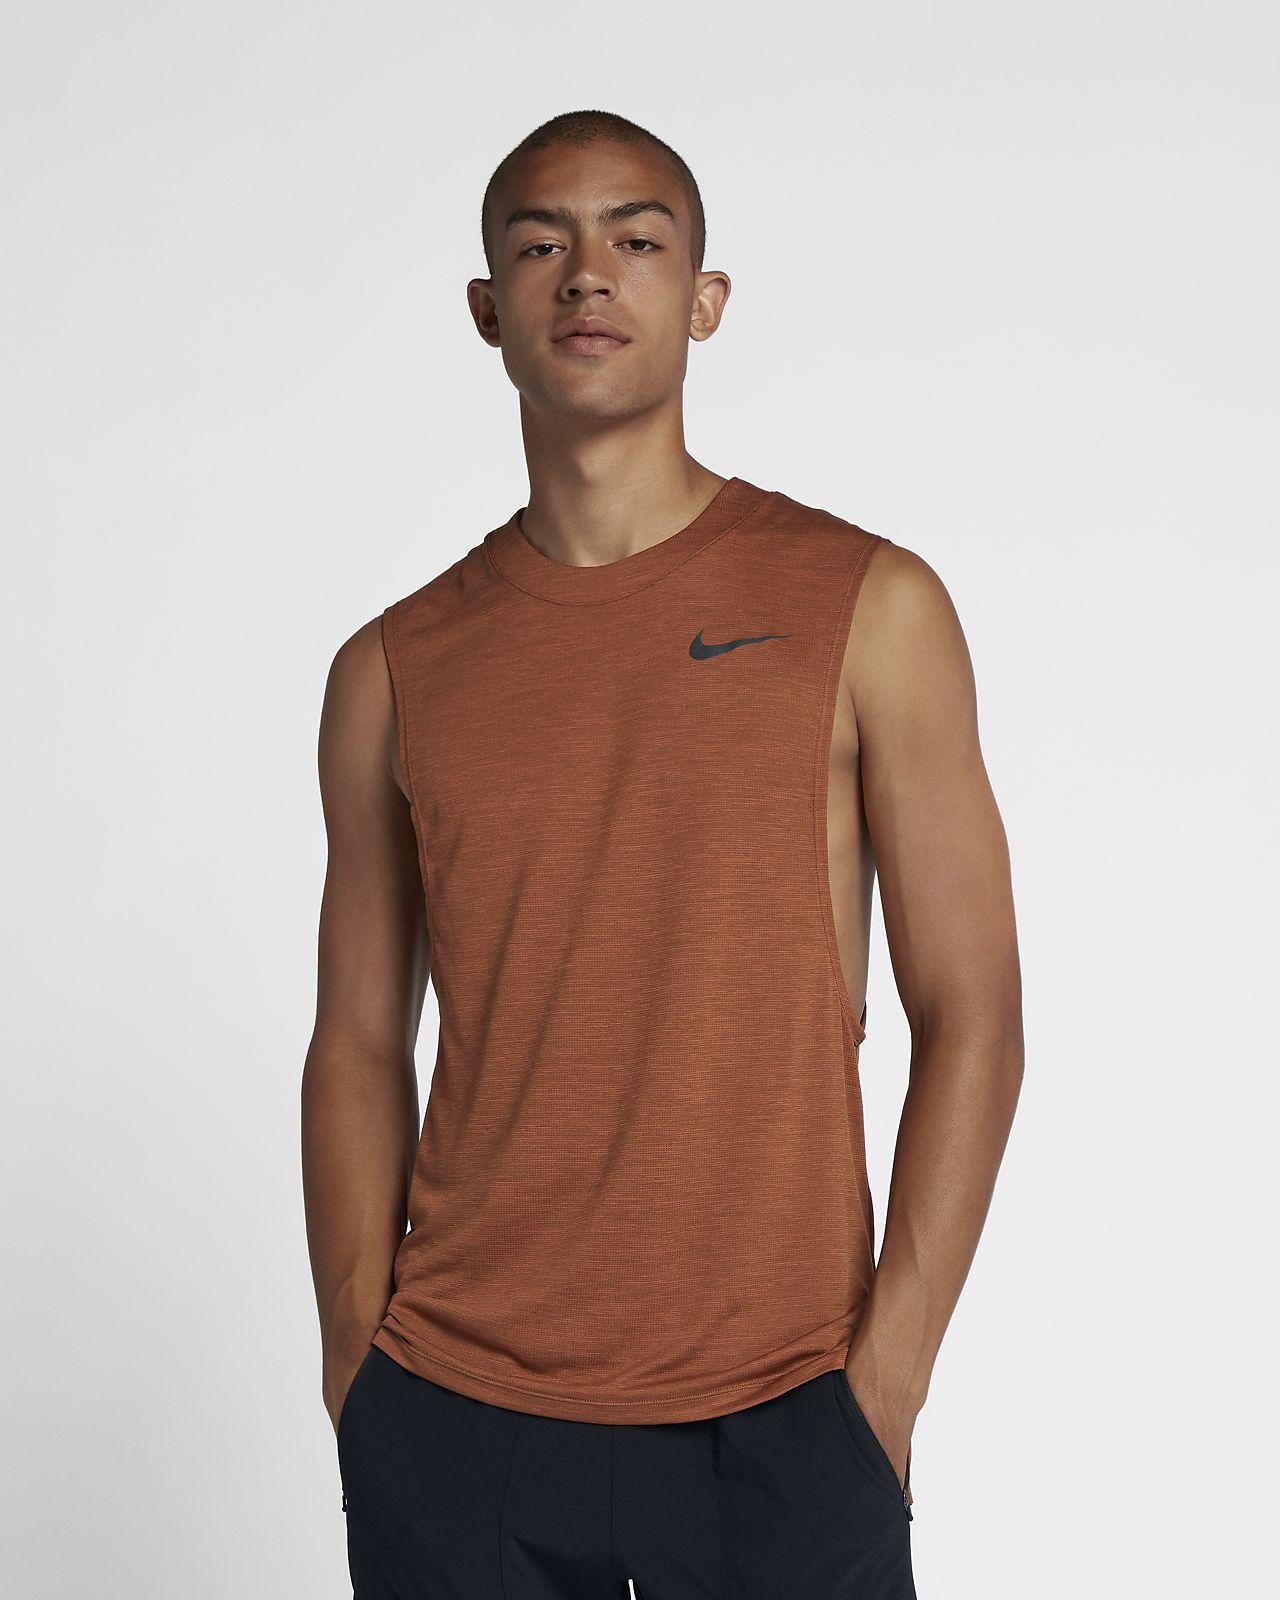 Nike Medalist Run Division ärmelloses Herren-Laufoberteil